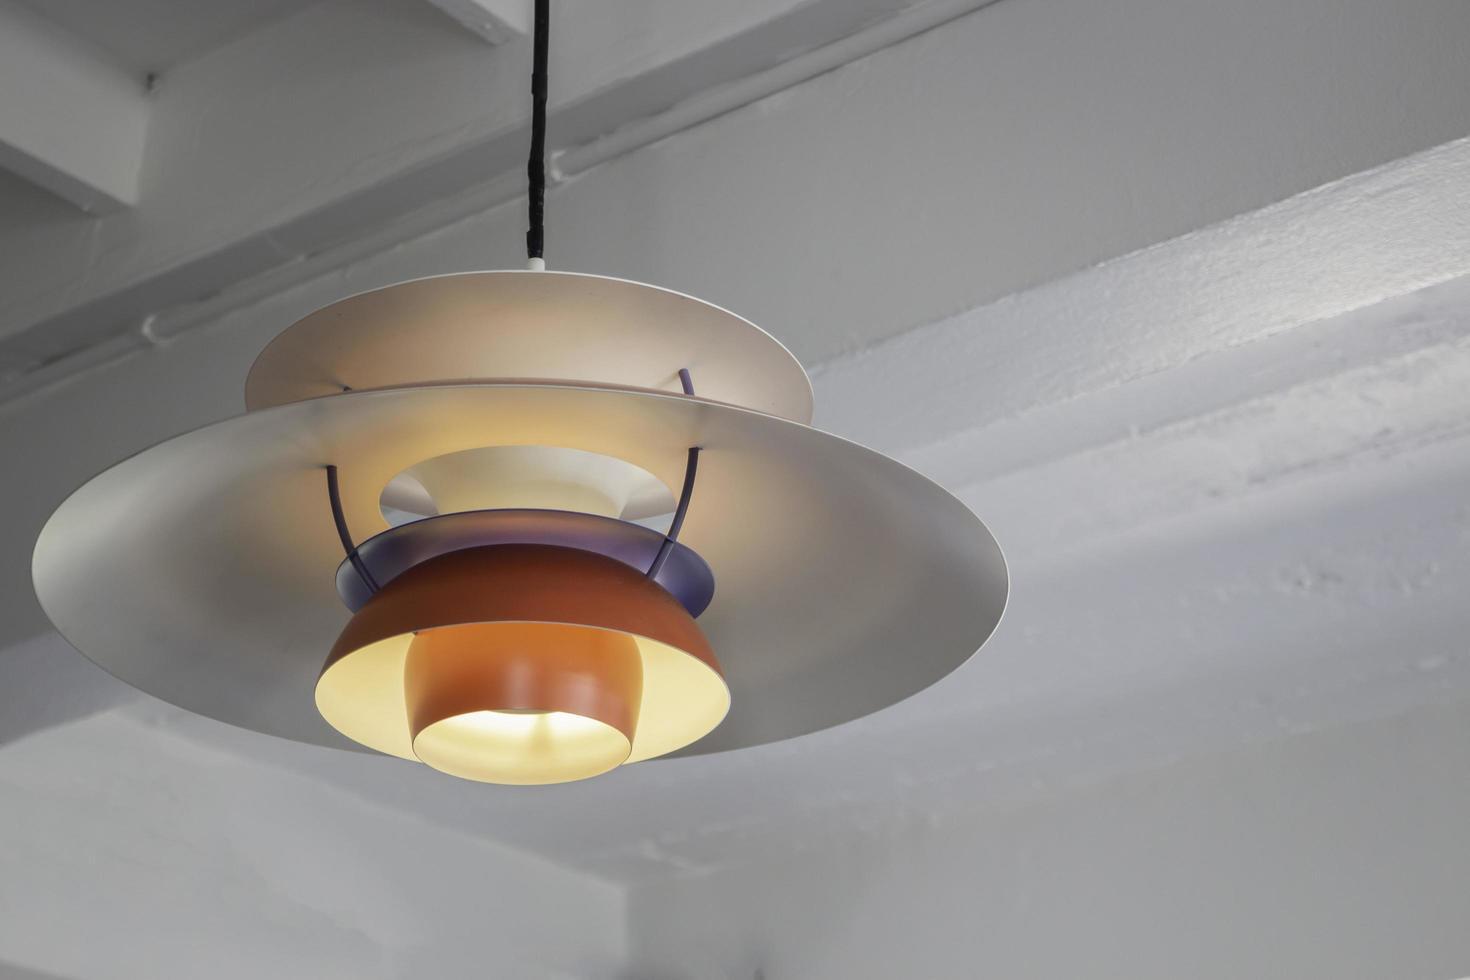 lampada a sospensione foto